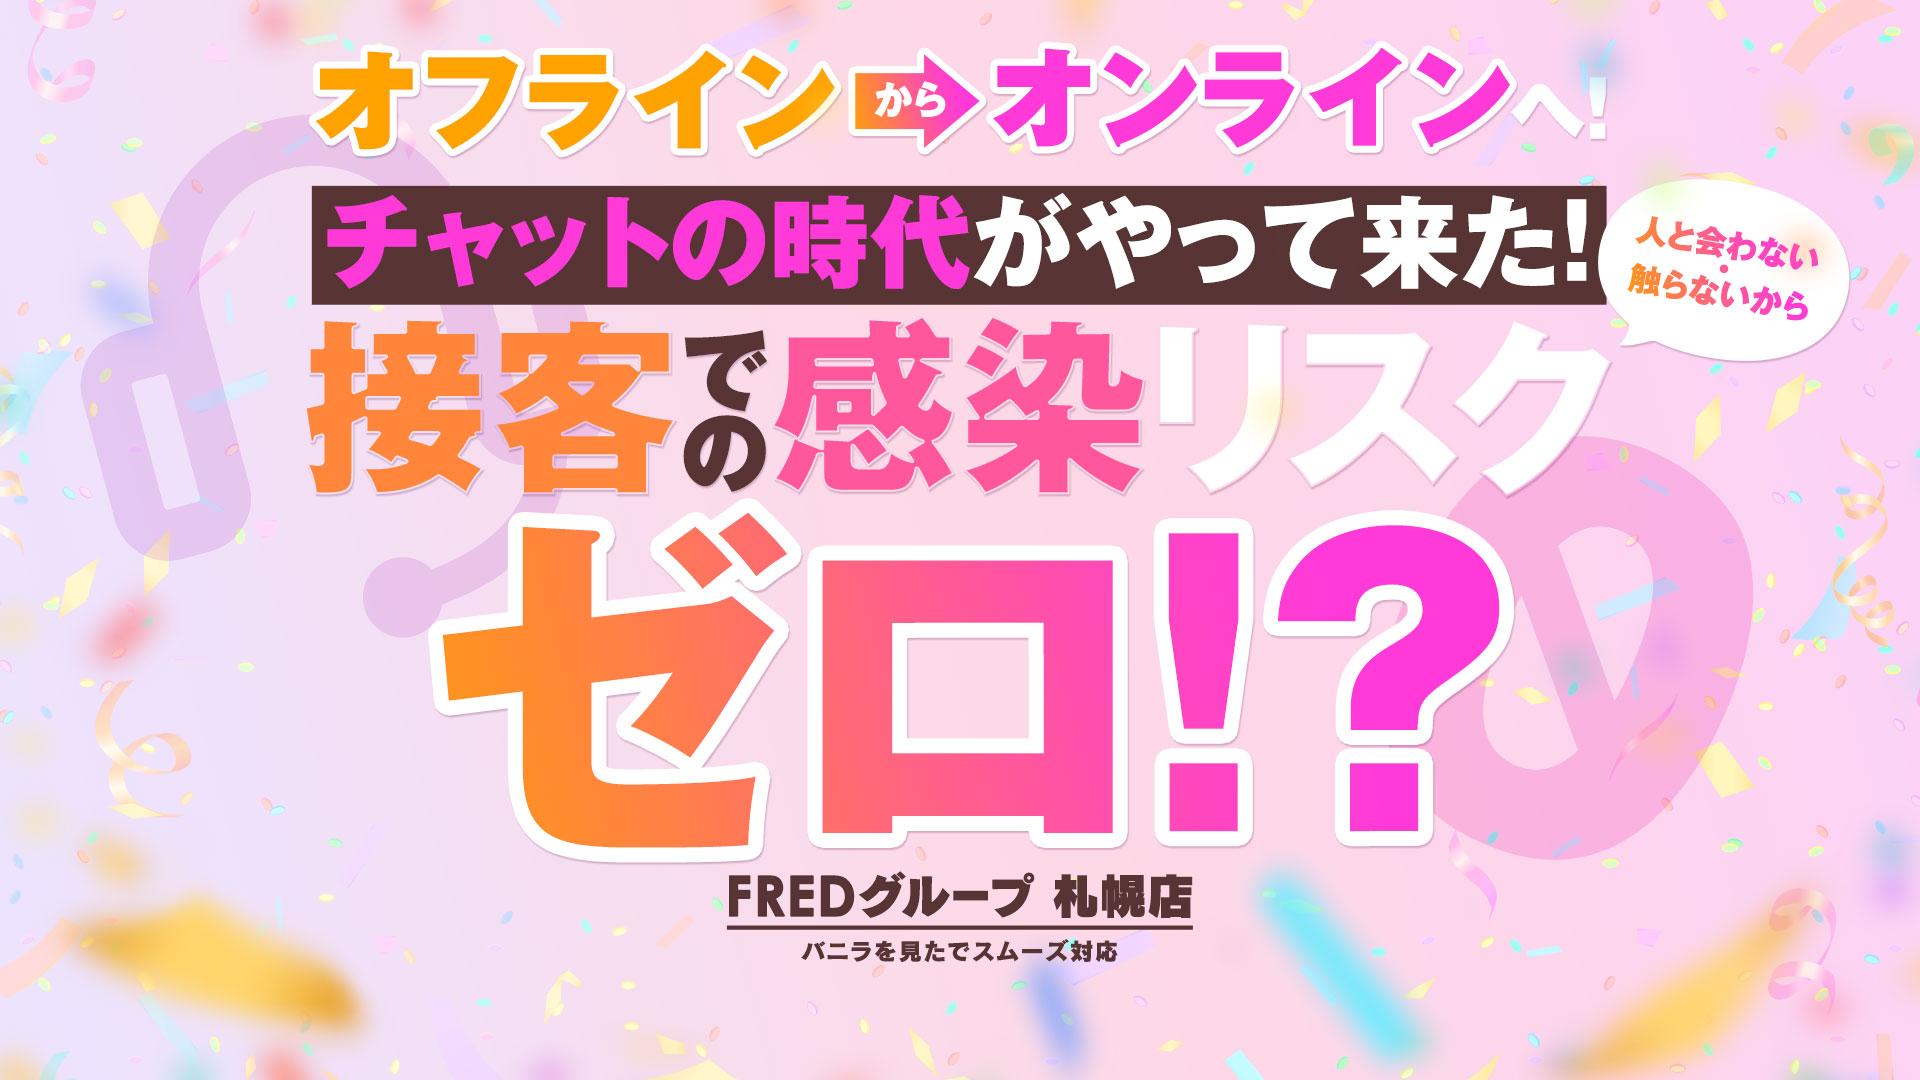 FRED(フレッド)グループ札幌店の求人画像